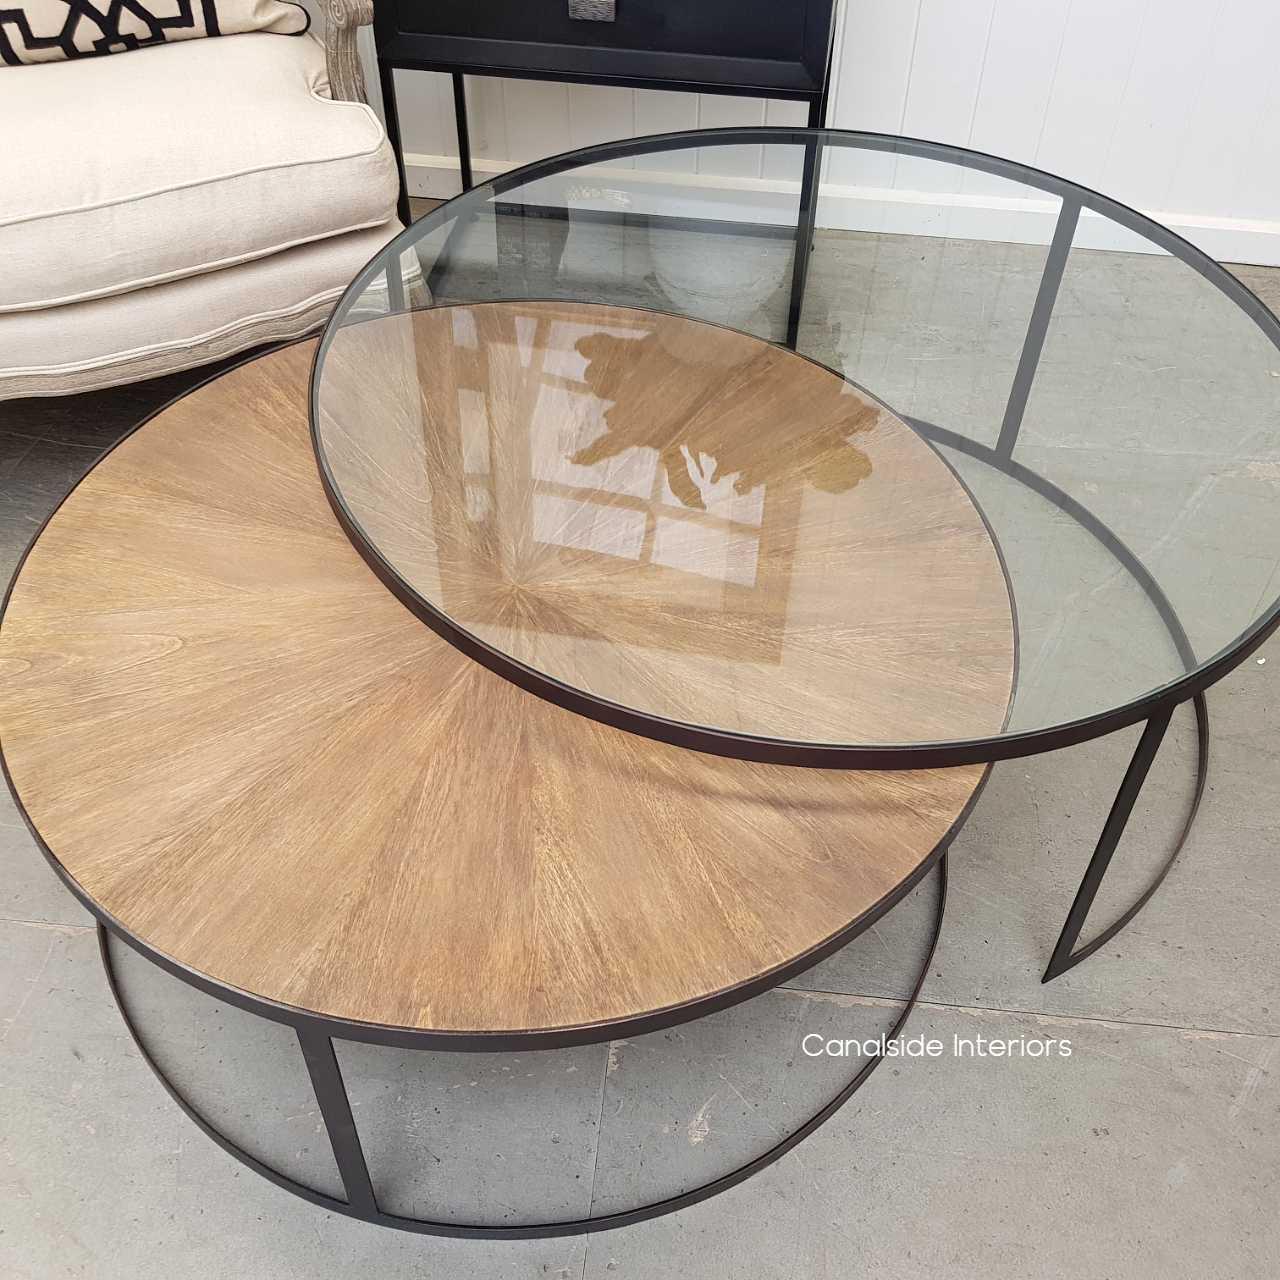 Bermuda Plantation Nesting Coffee Table  TABLES, TABLES Coffee Tables, LIVING Room, LIVING Coffee & Side Tables, PLANTATION STYLE